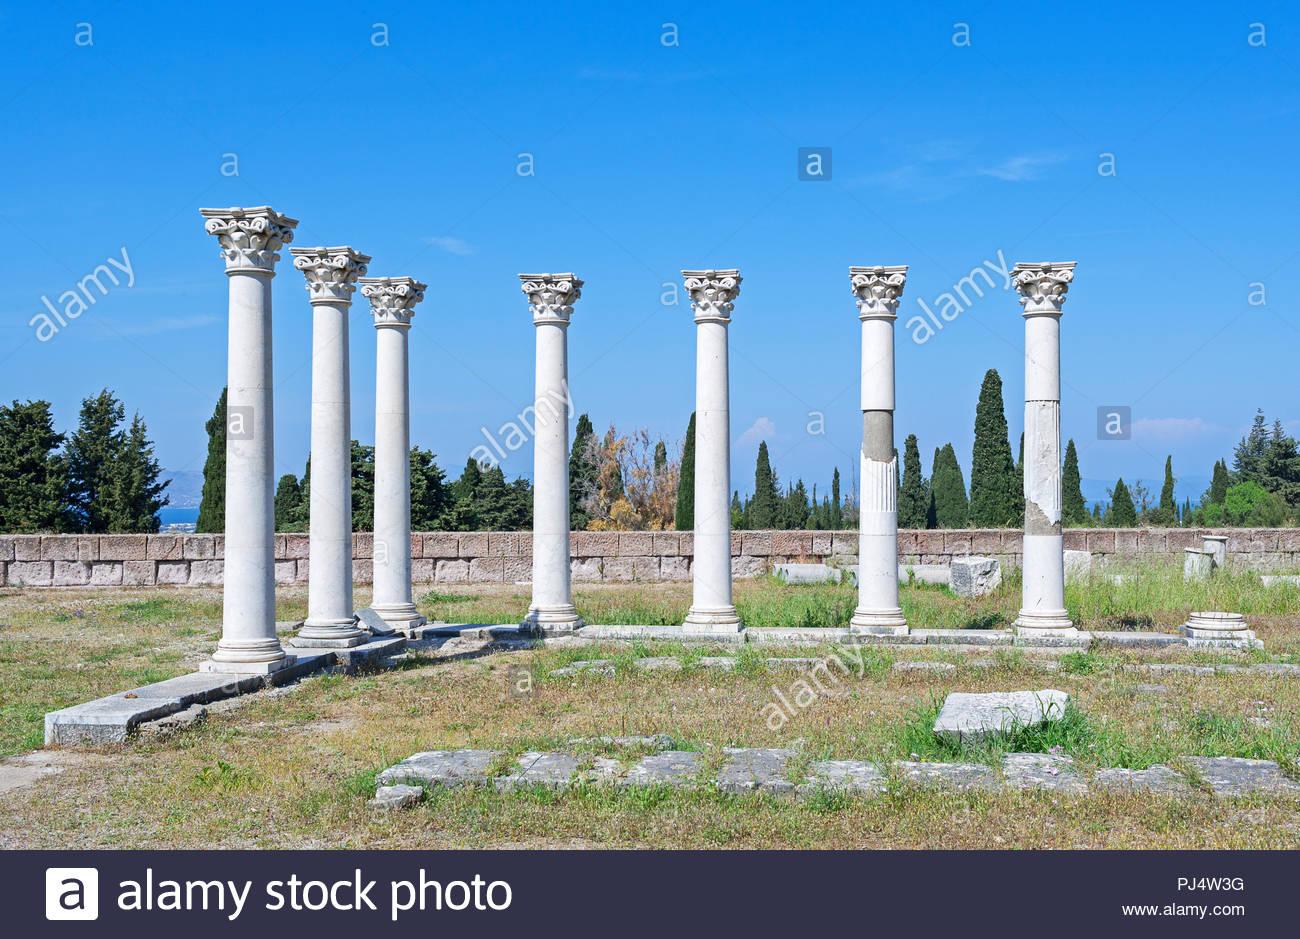 Temple of Apollo, The Asklepienon, Asclepion, Kos, Dodecanese Islands, Greece, Europe - Stock Image